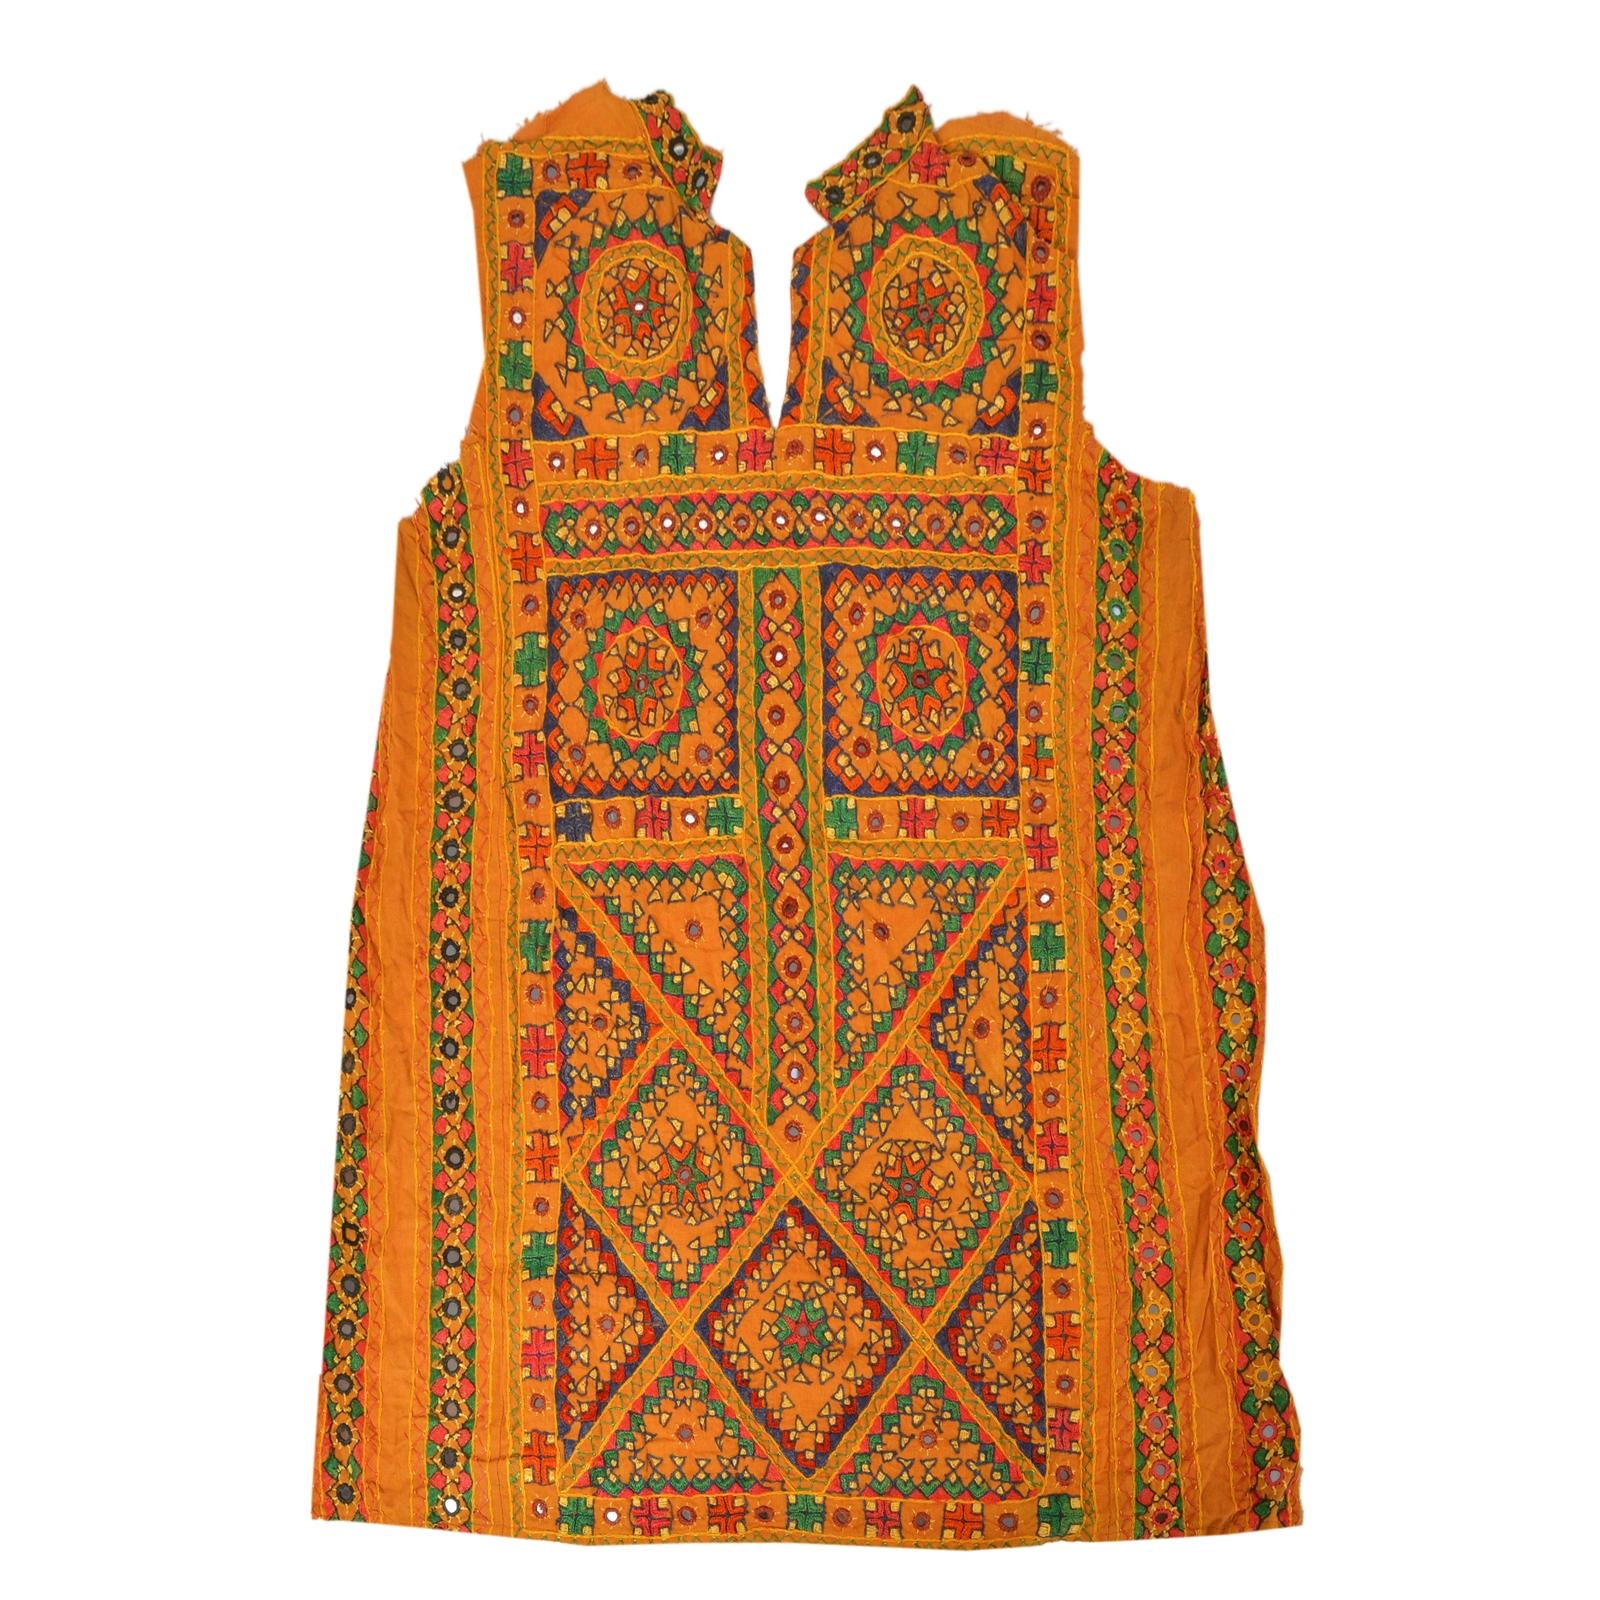 Details about Sanskriti Vintage Cotton Hand Embroidered Kutch Work Design  Fabric Neck Patch Cr